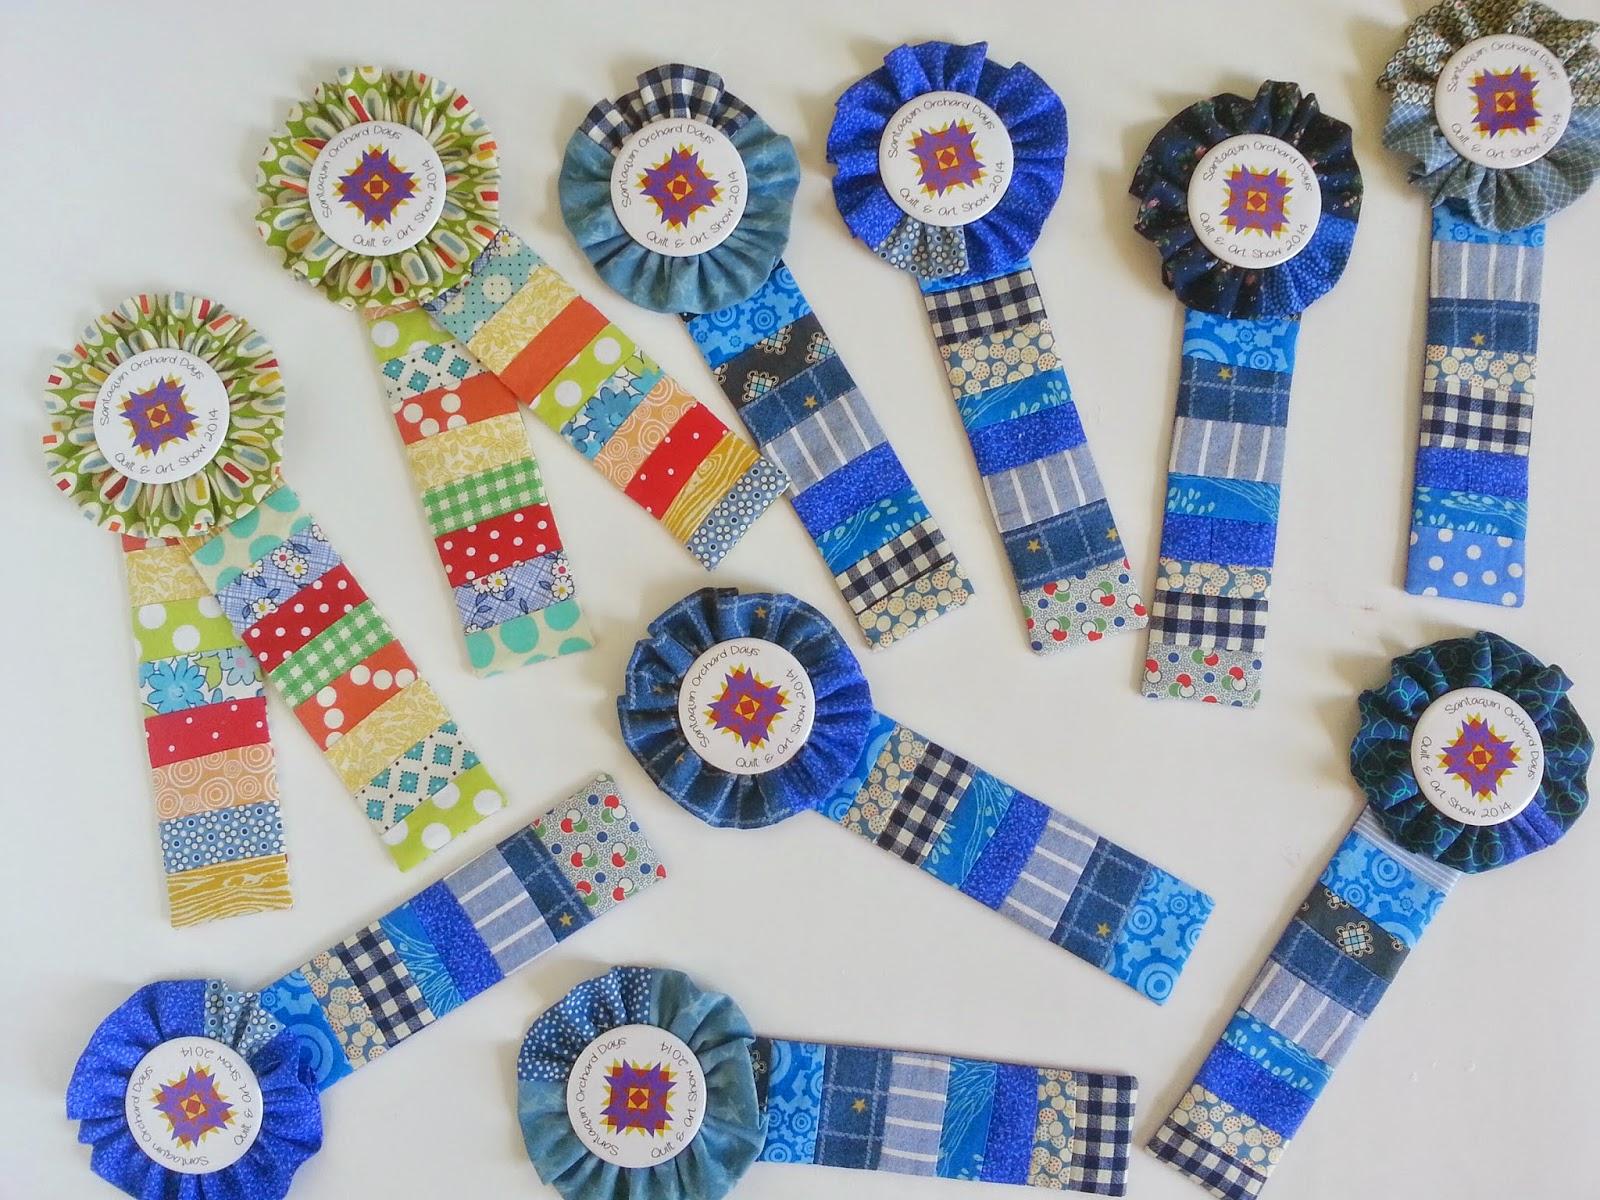 Handmade Quilt Show Fair Ribbons